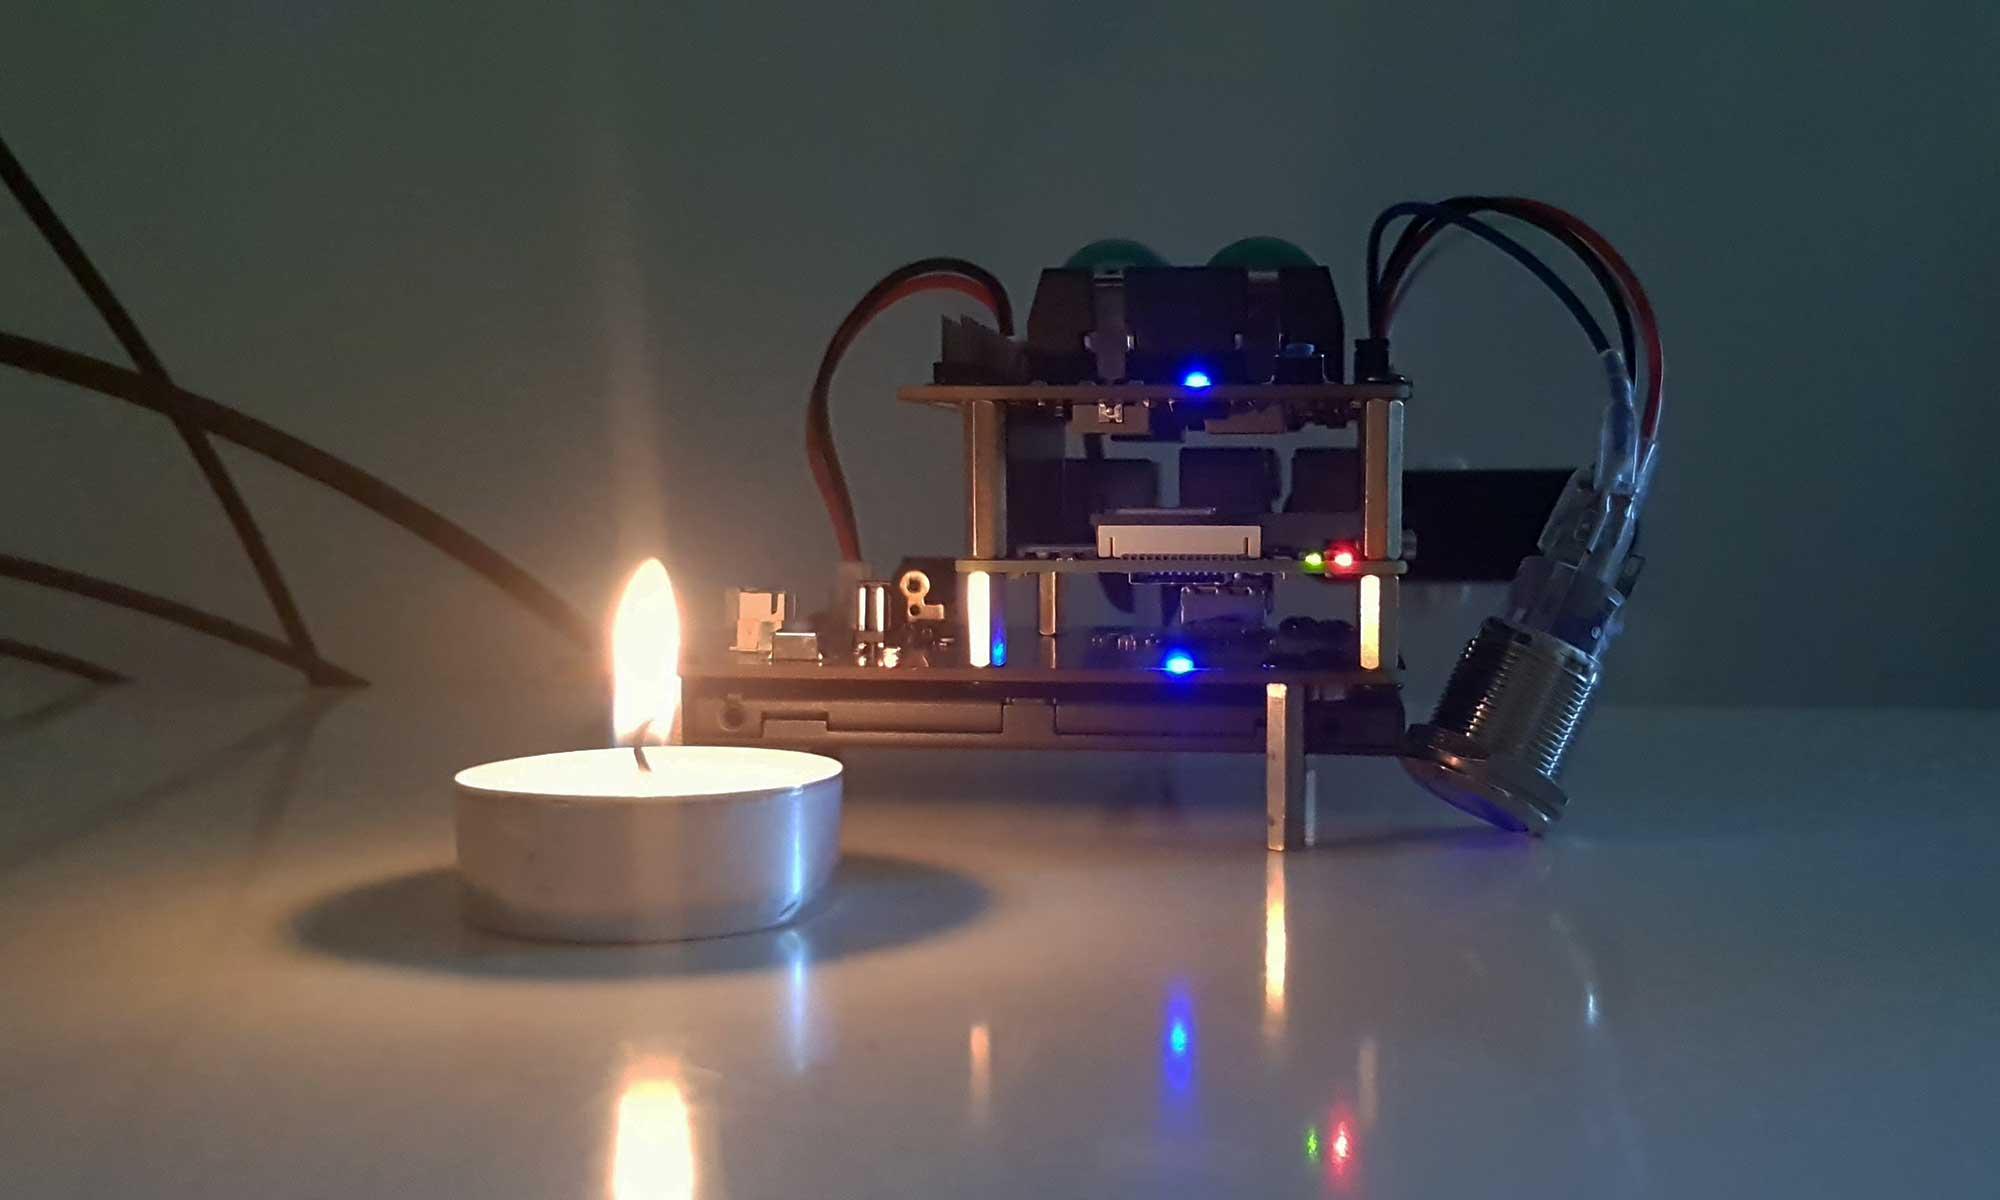 Technologie bij kaarslicht